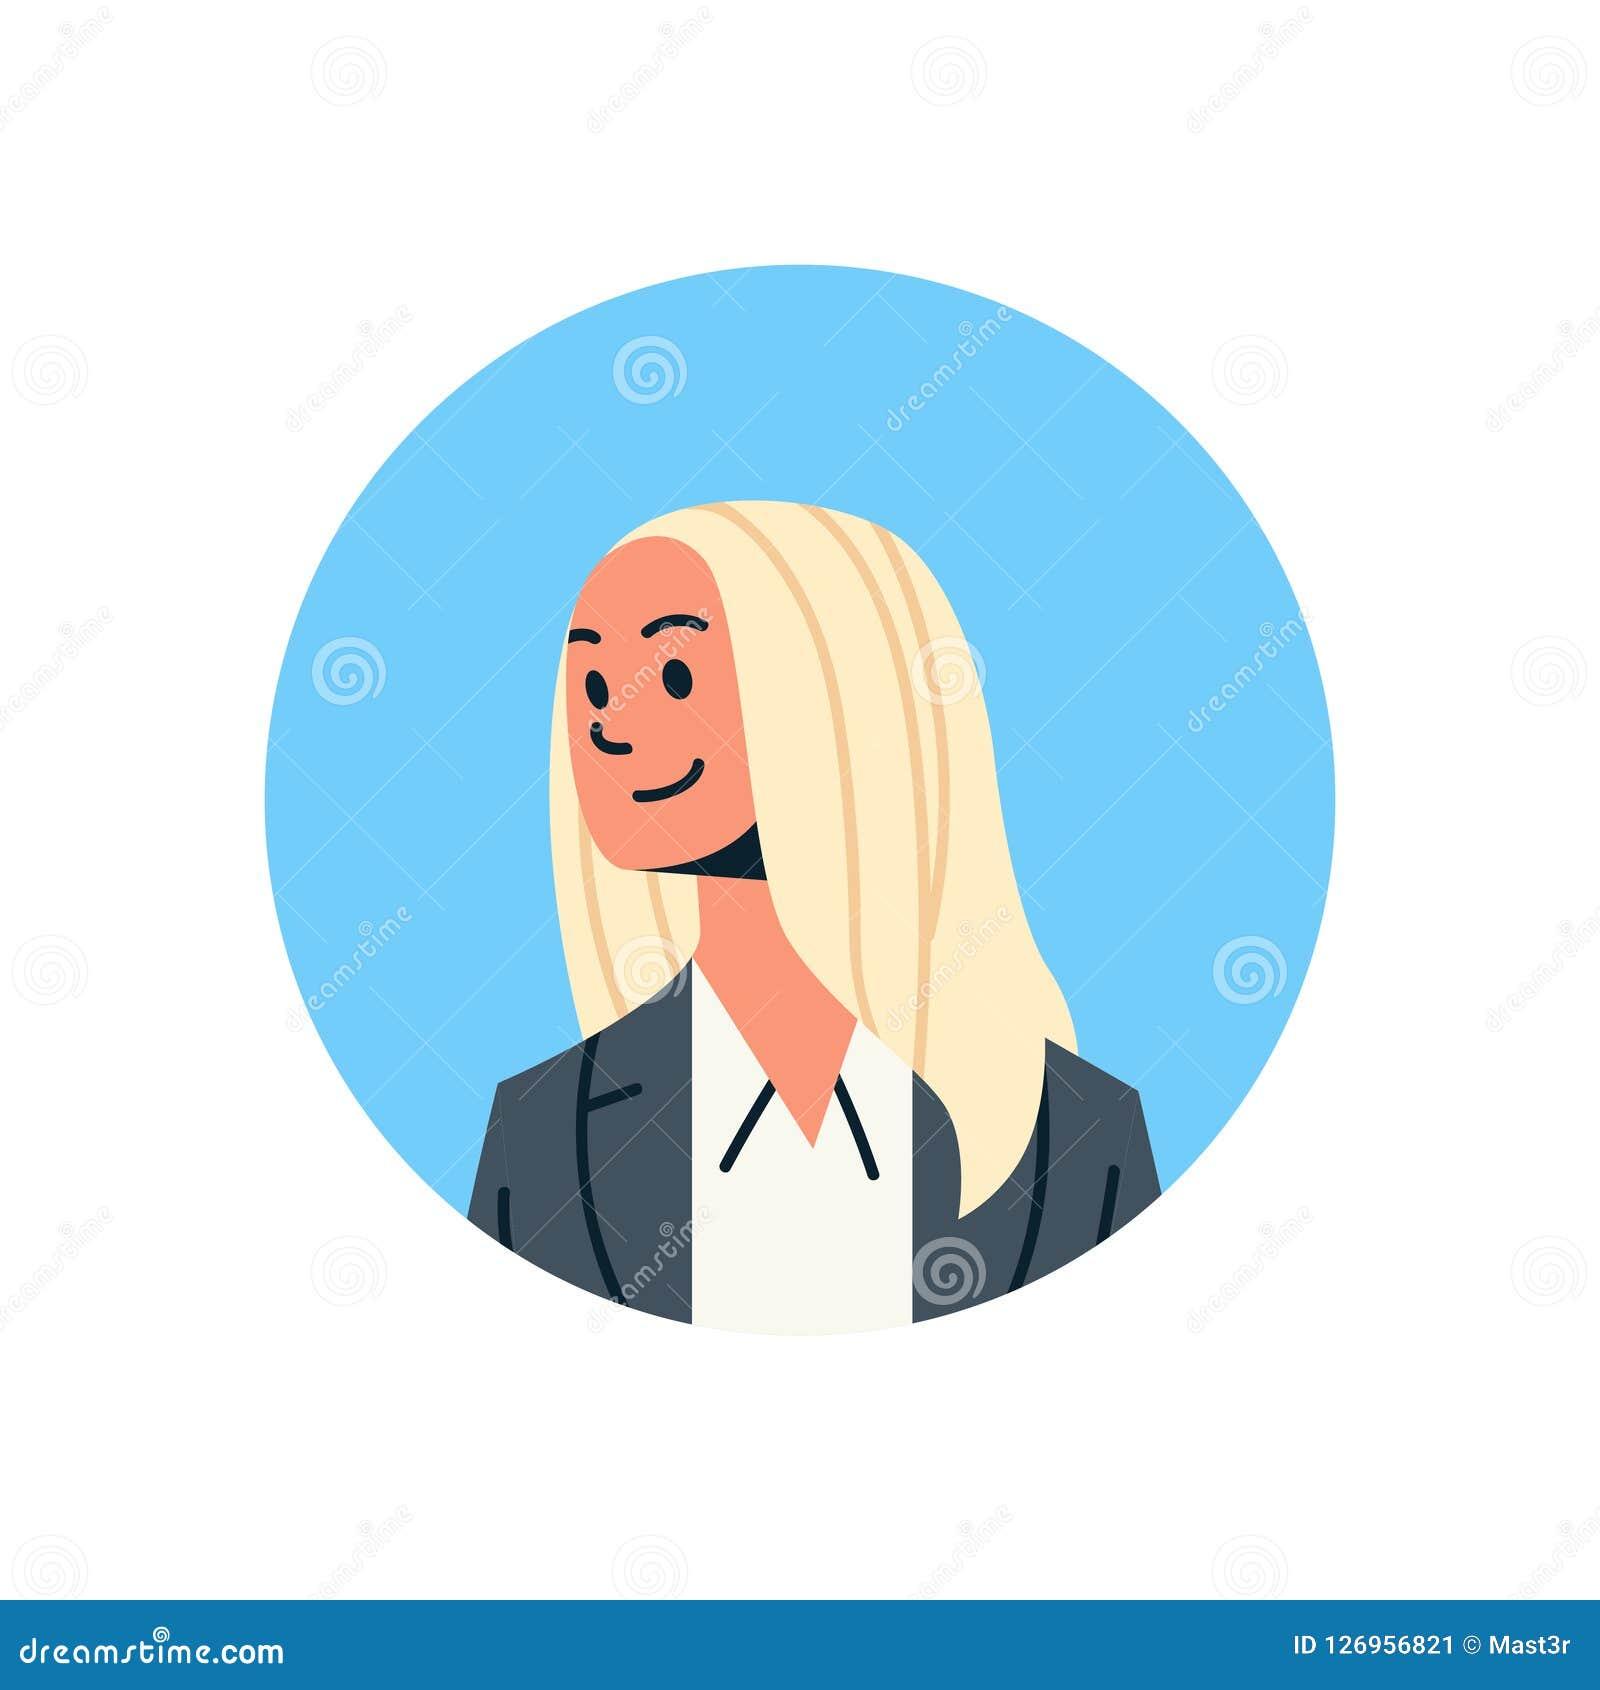 Blonde Businesswoman Avatar Woman Face Profile Icon Concept Online